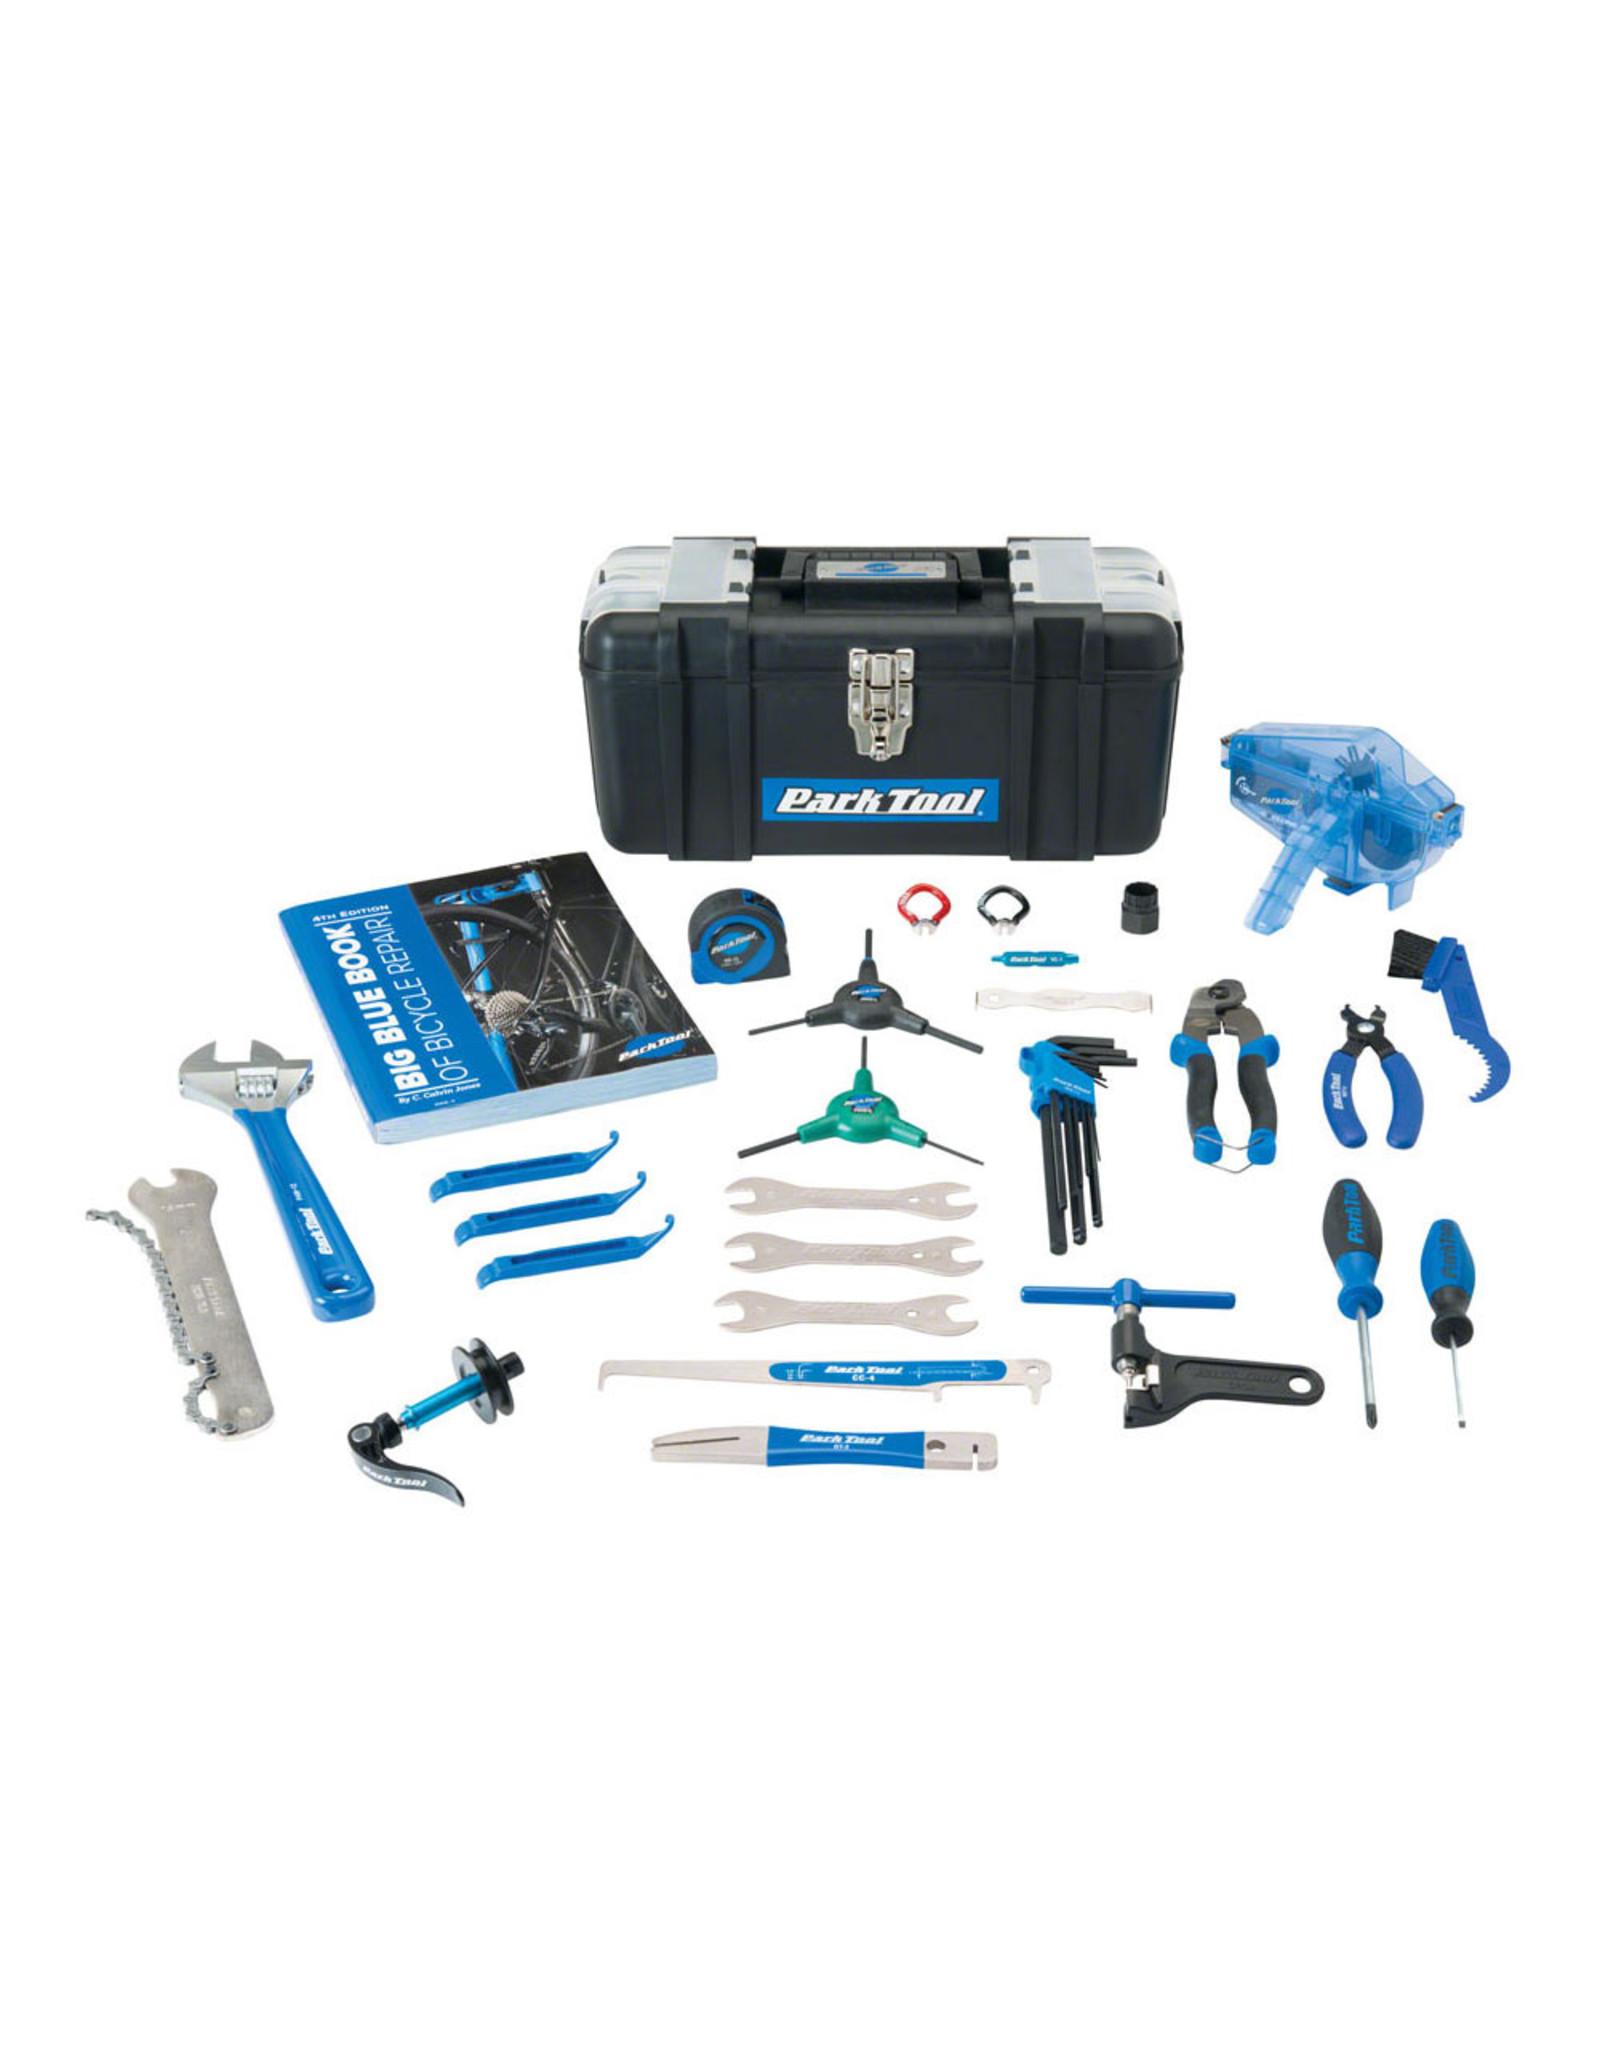 Park Tool Park Tool AK-5 Advanced Mechanic Tool Kit